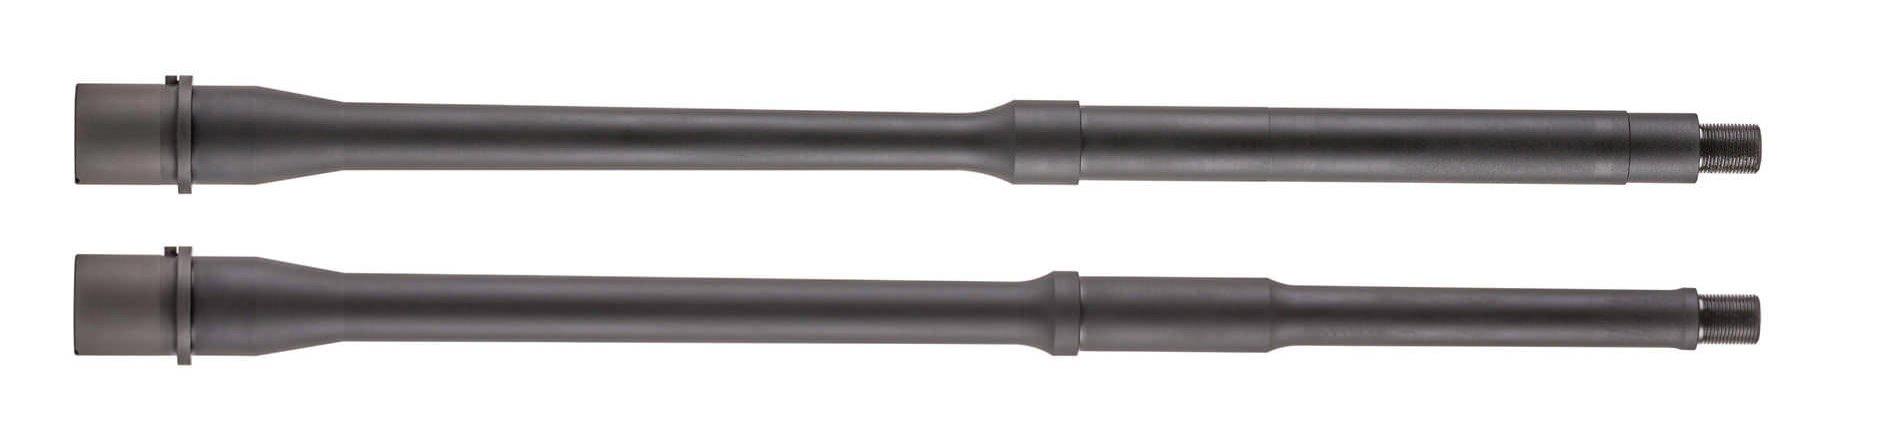 "A comparison of a 16"" Government Profile barrel and a 16"" Lightweight Profile barrel produced by Daniel Defense"